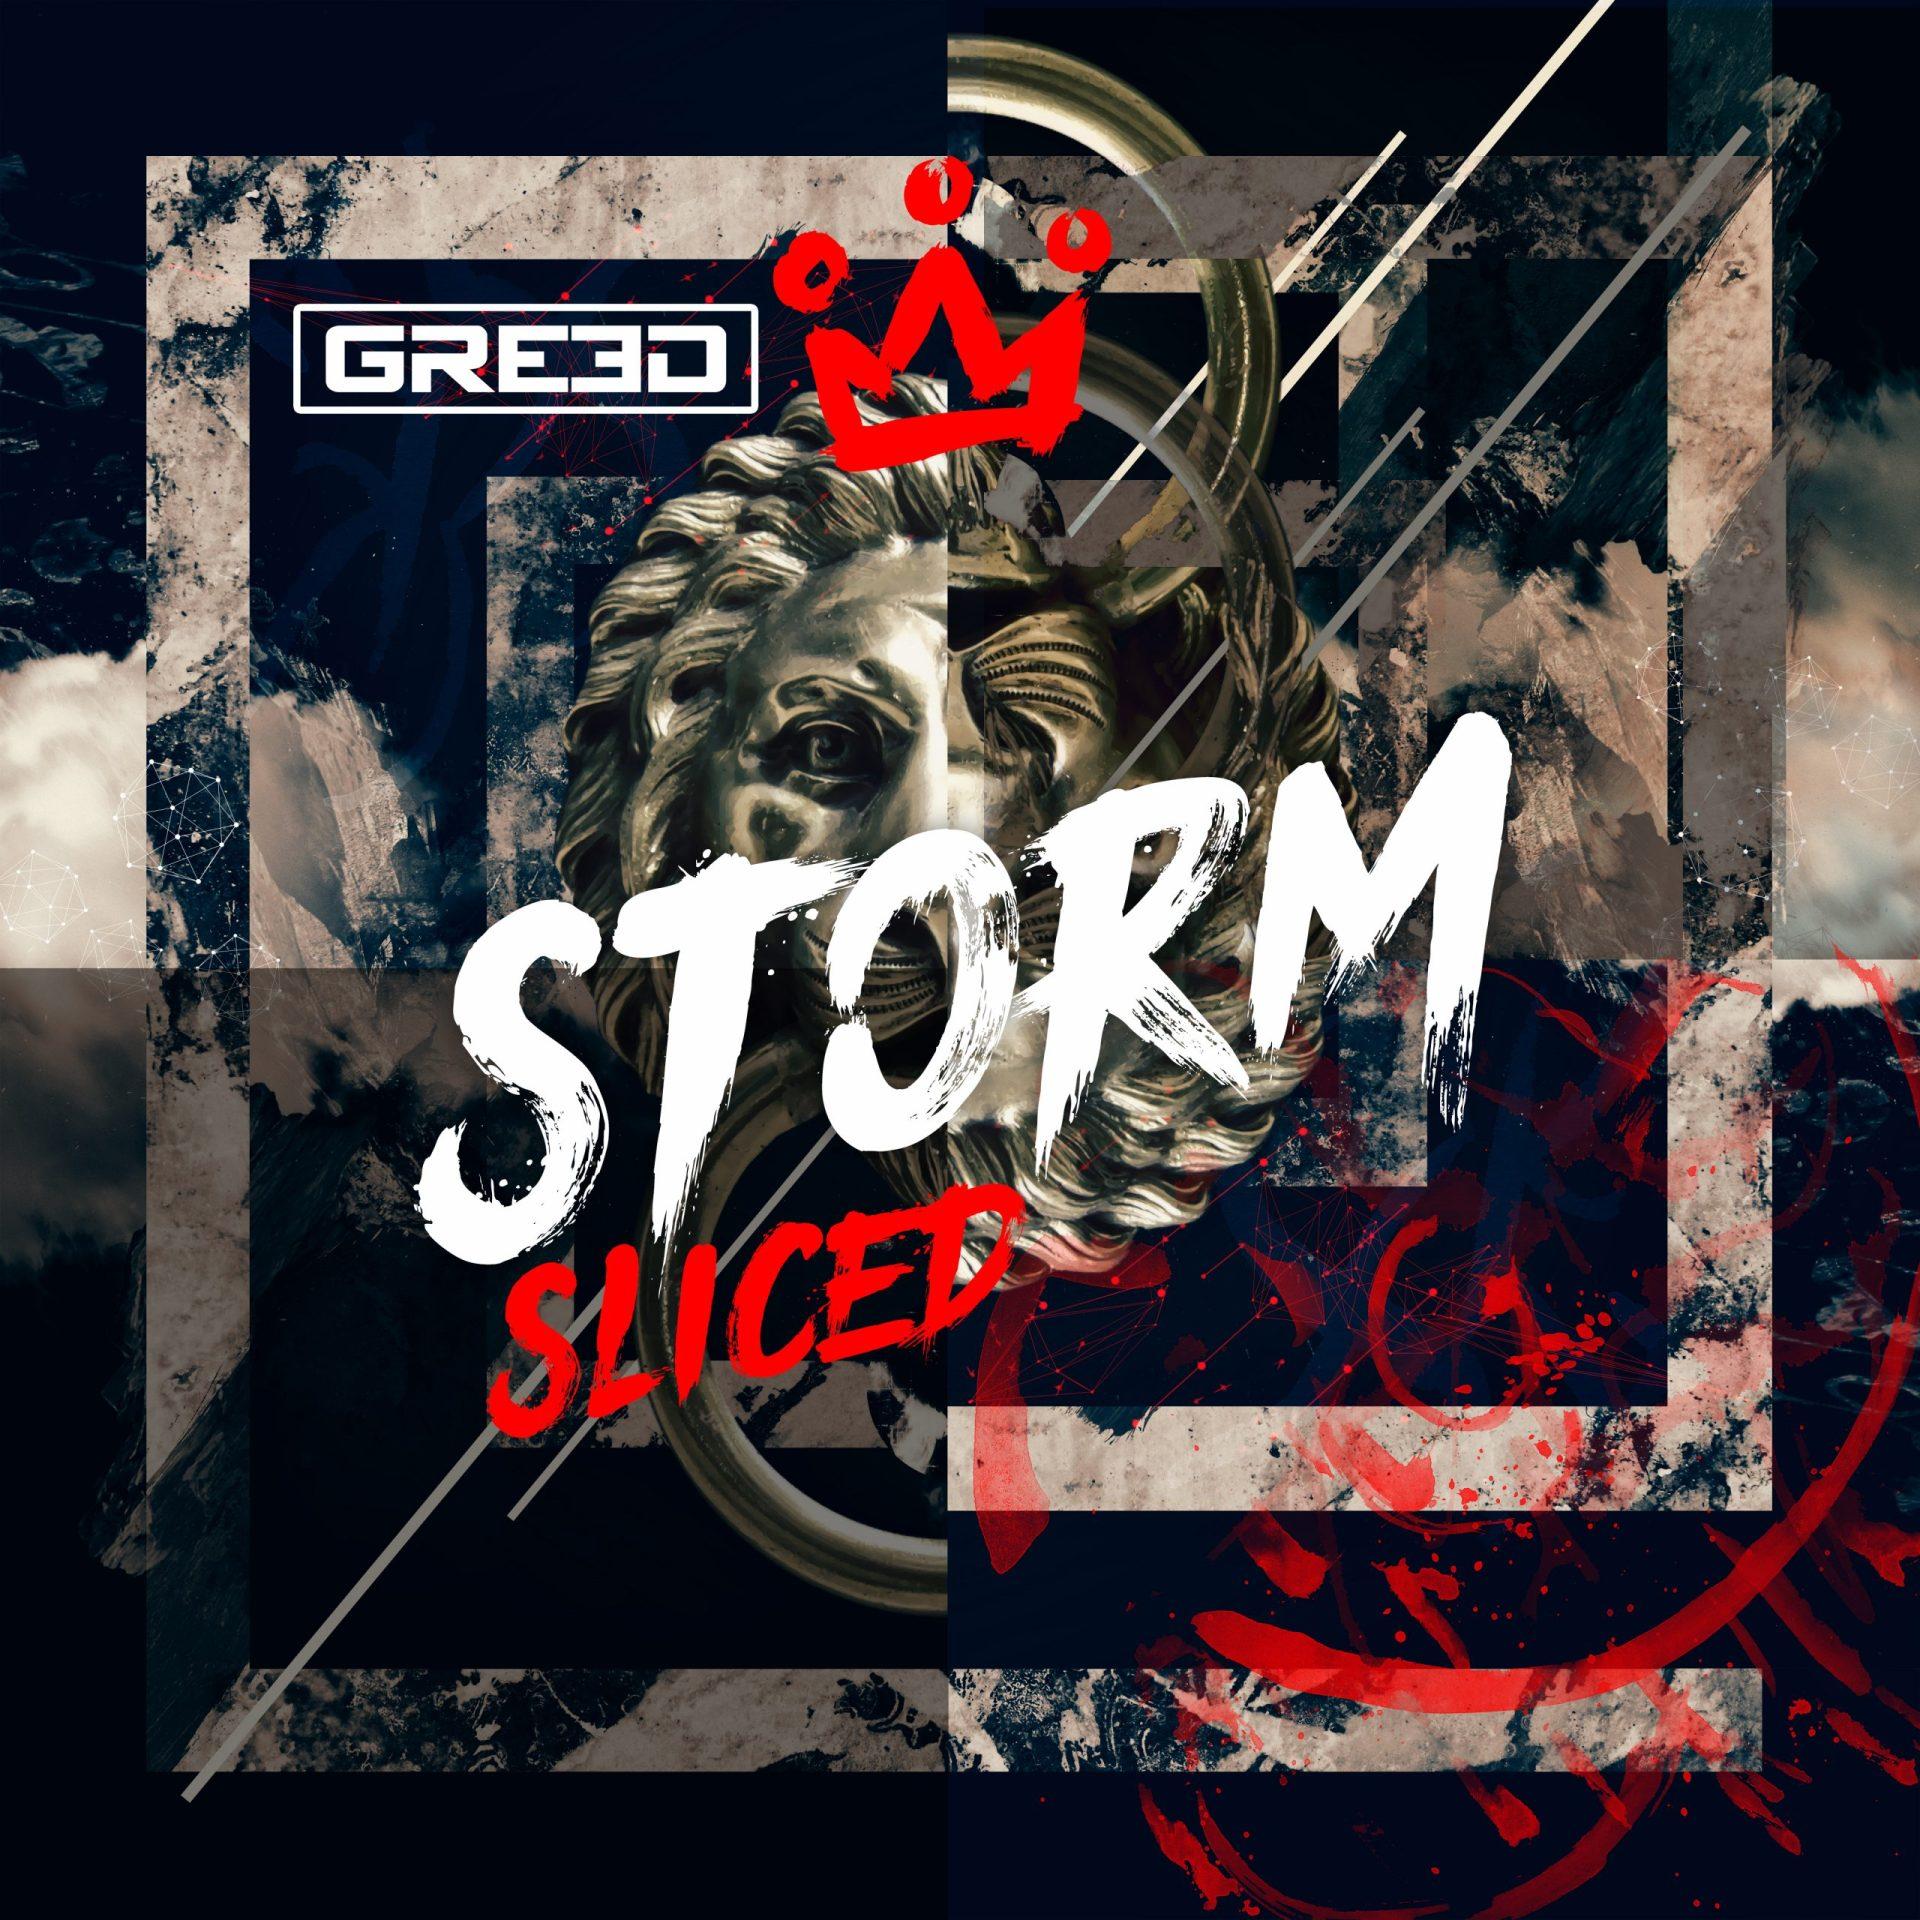 GR33D storm sliced album art cover design